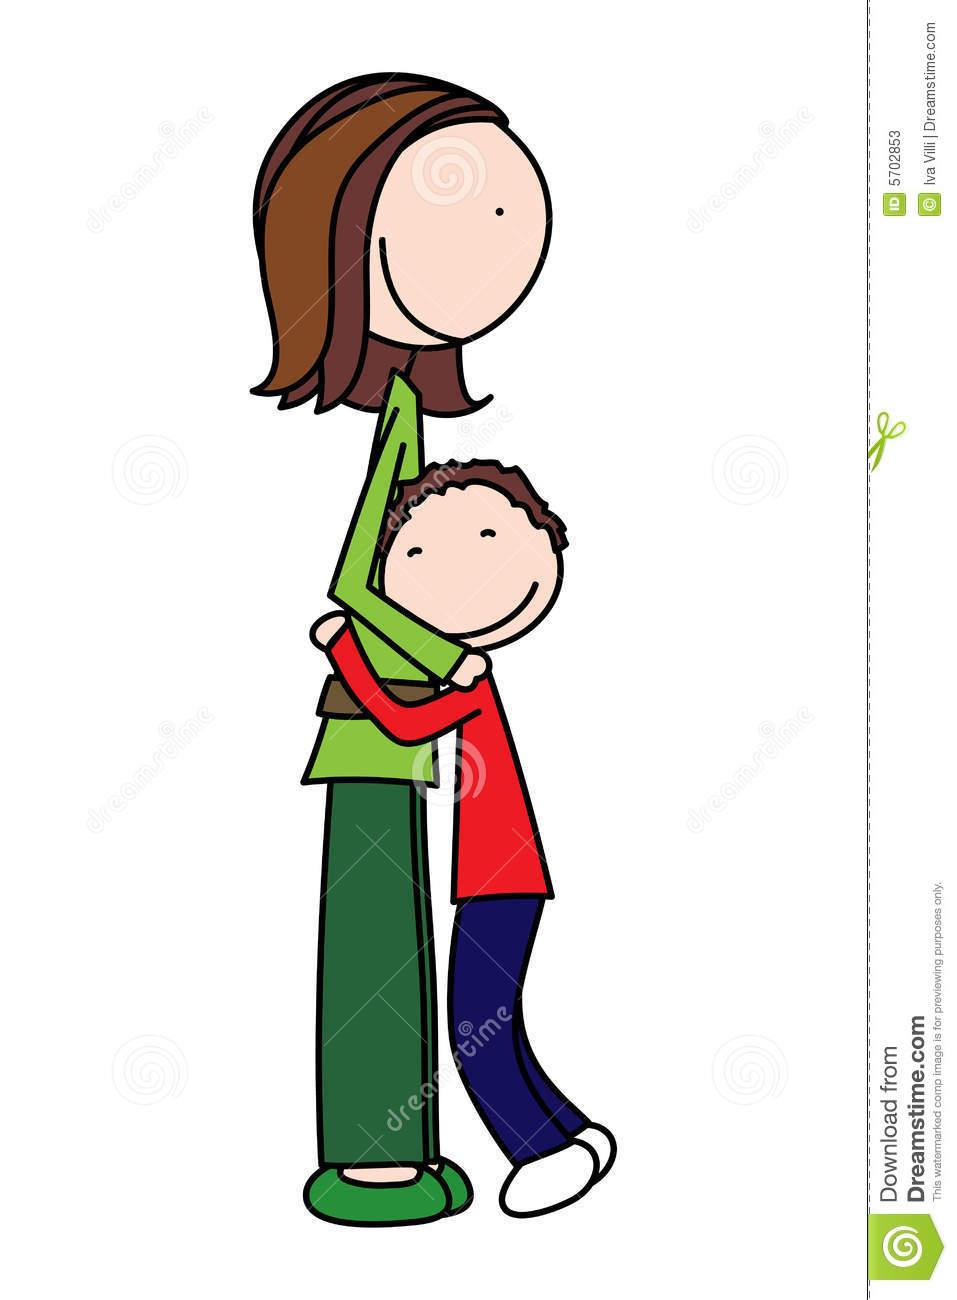 Hugging clipart printable. Hug free download best